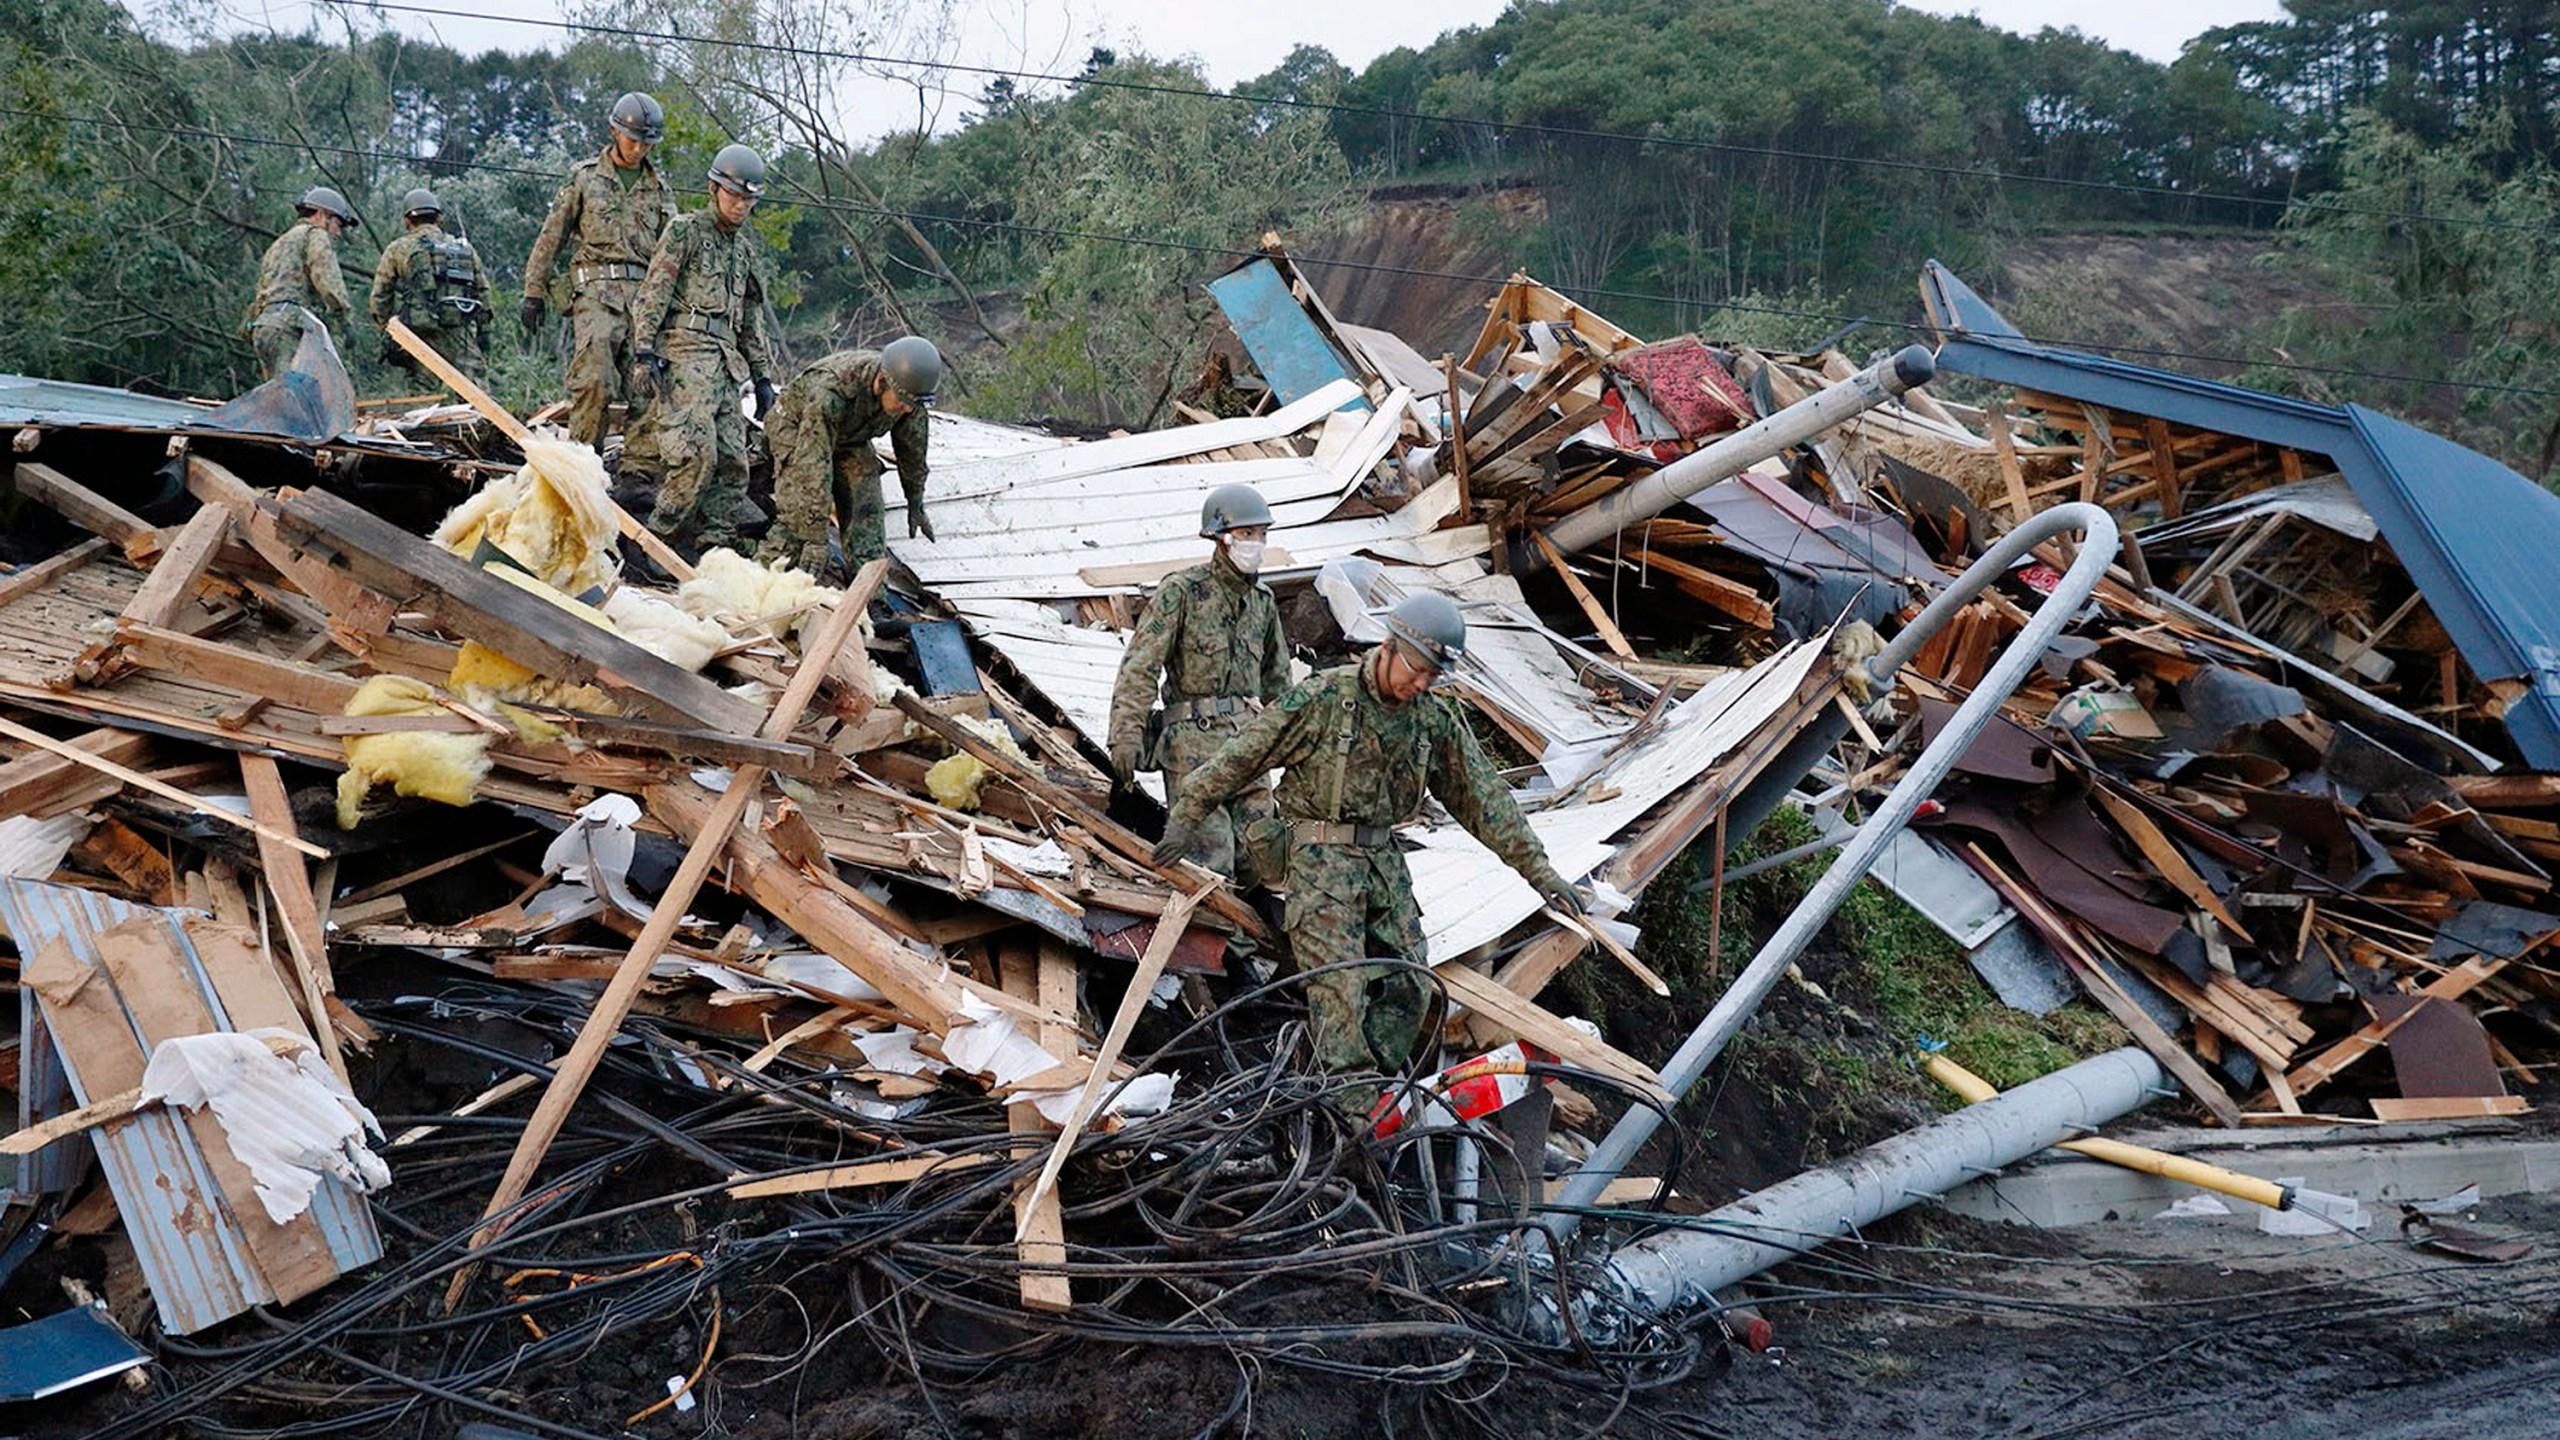 Japan_Earthquake_72516-159532.jpg39680543